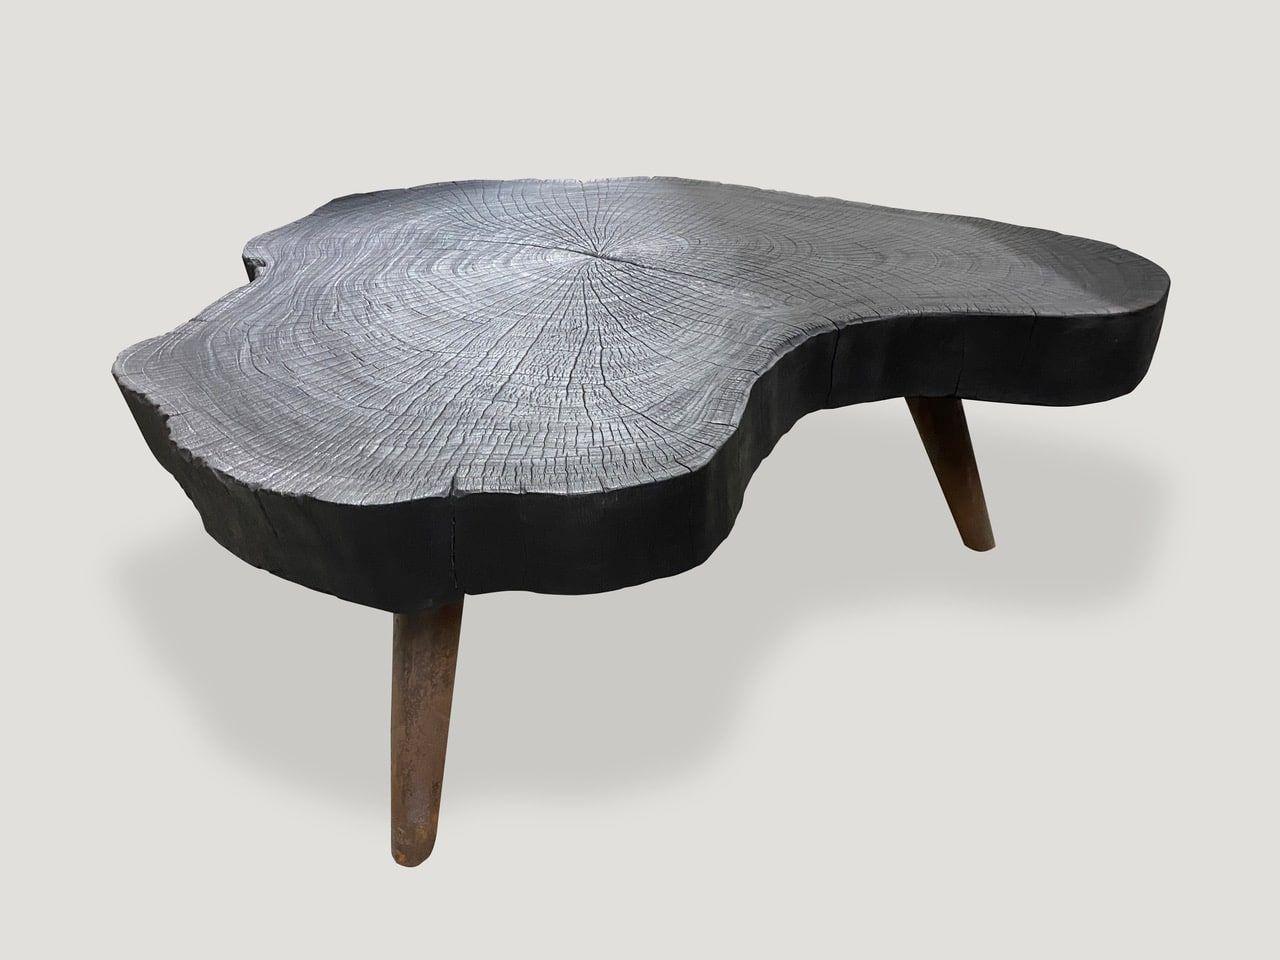 Charred Furniture Triple Burnt Collection Andrianna Shamaris Coffee Table Organic Wood Century Modern Furniture [ 960 x 1280 Pixel ]